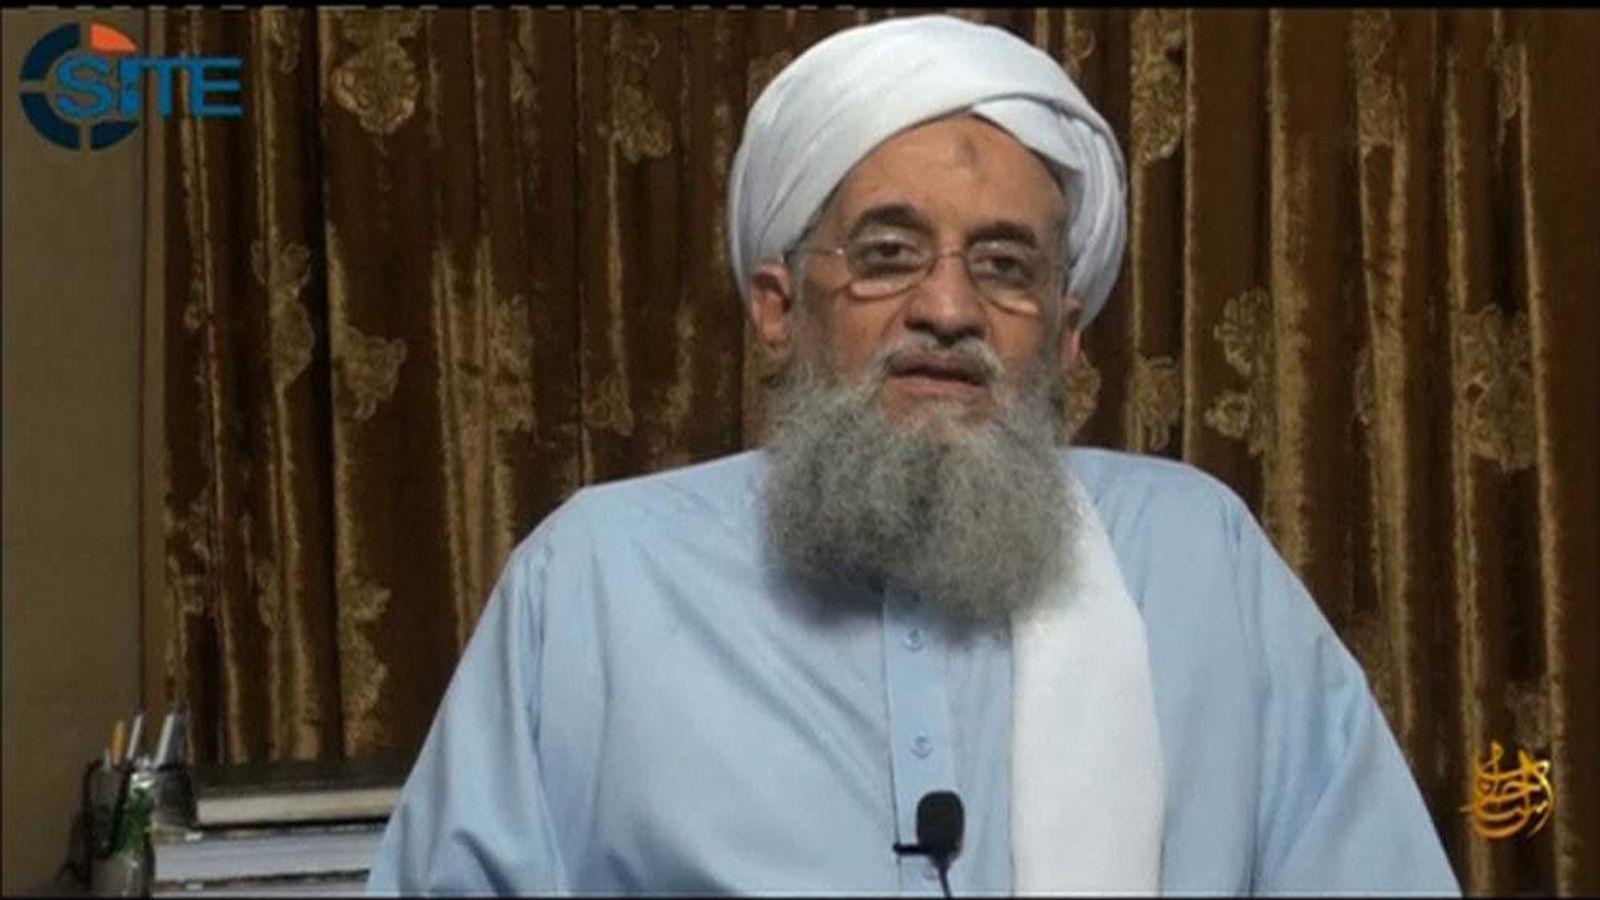 AL QAEDA LEADER, AYMAN AL ZAWAHRI